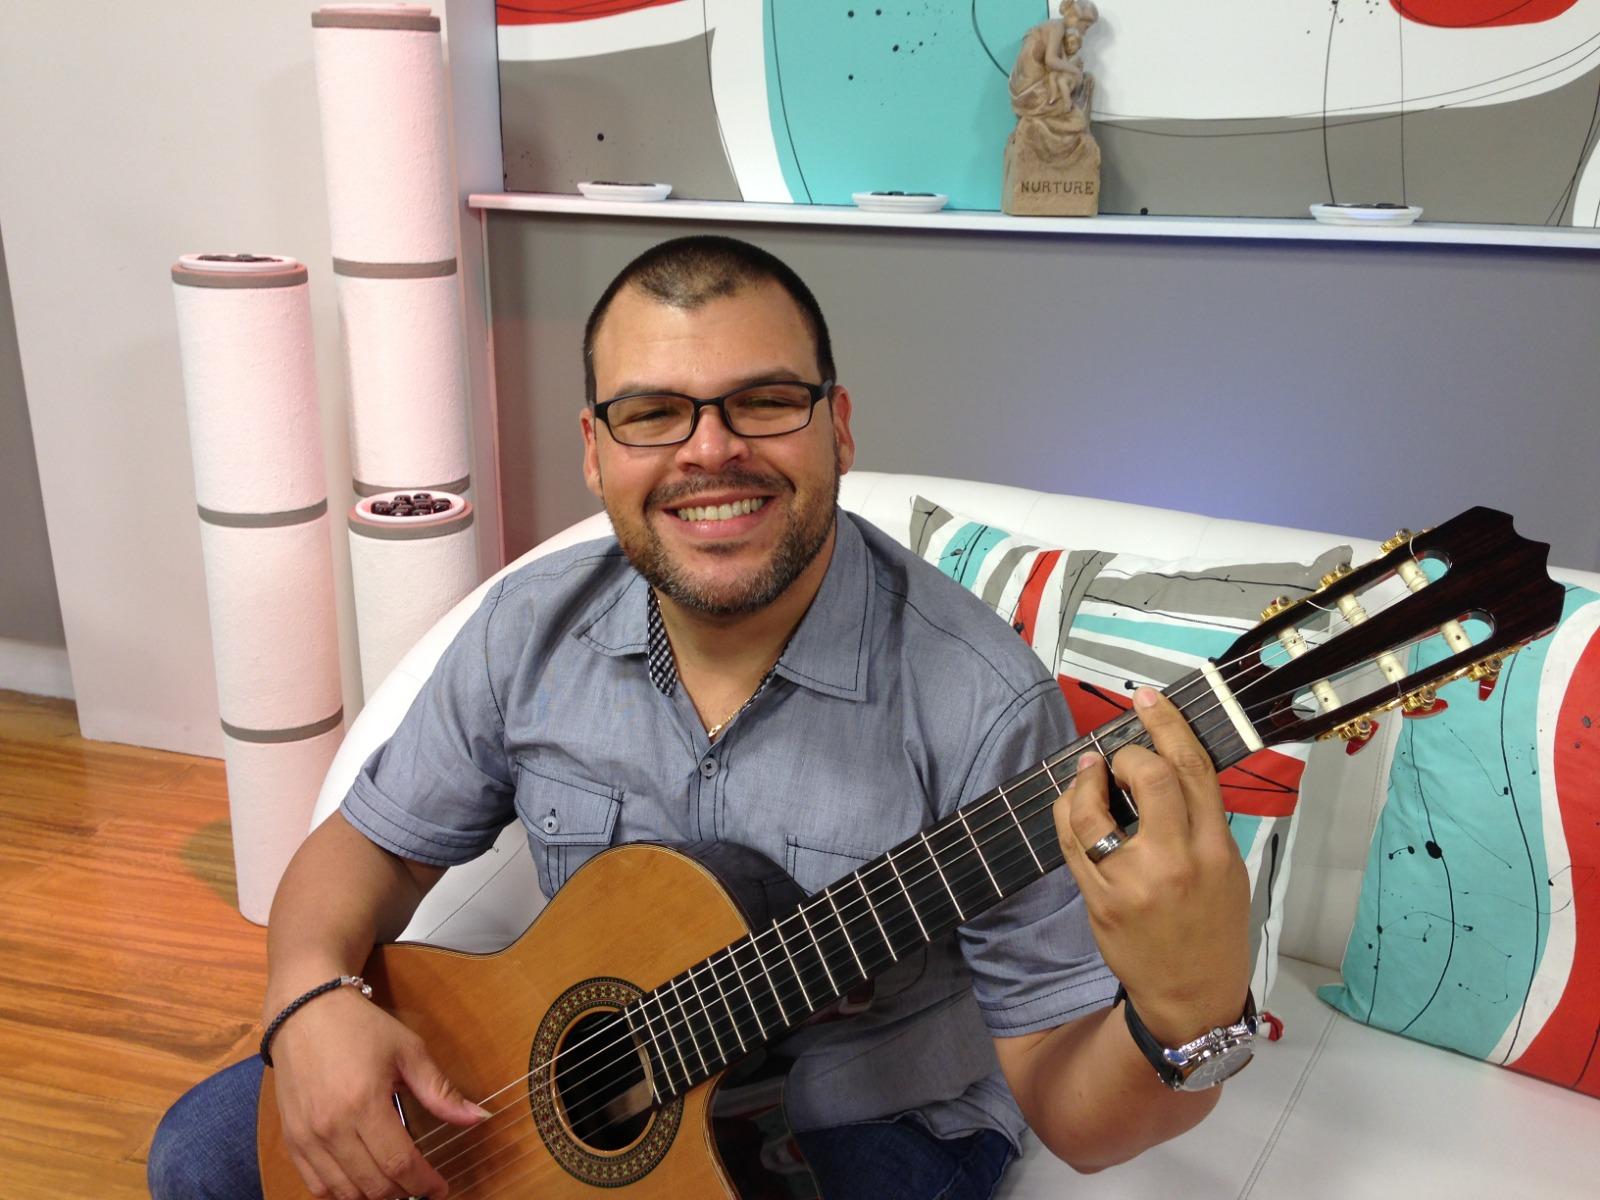 Pedro Juan Rivera se presentan por primera vez en México